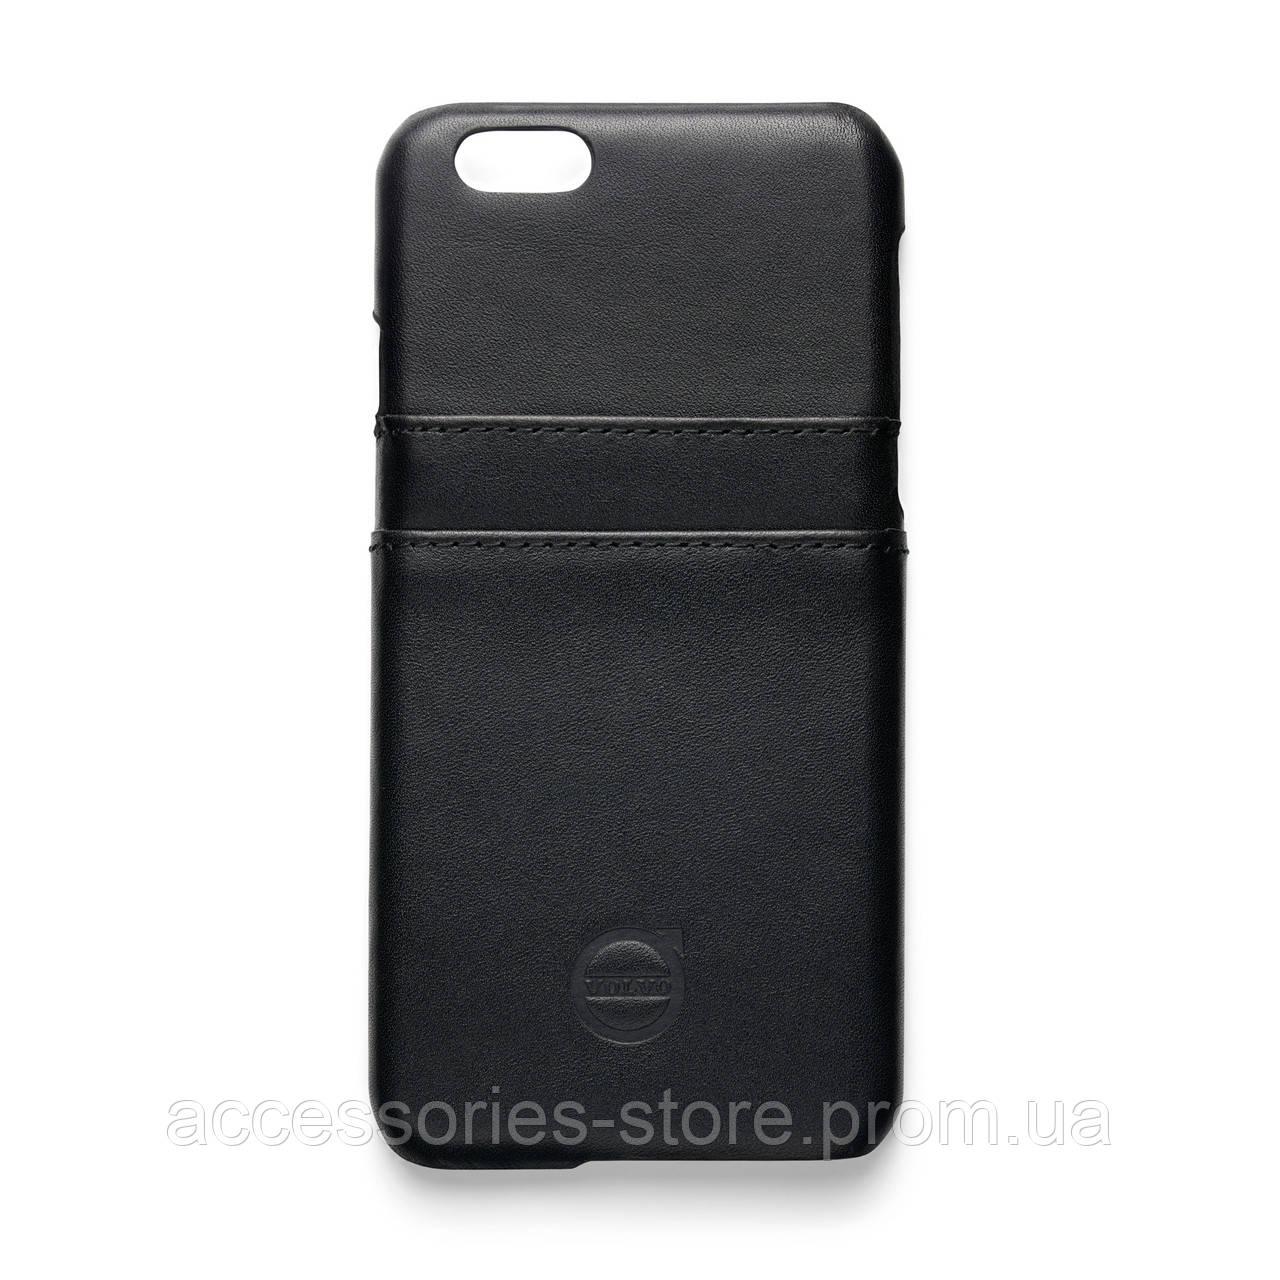 Чехол кожаный Volvo Leather iPhone 7 case